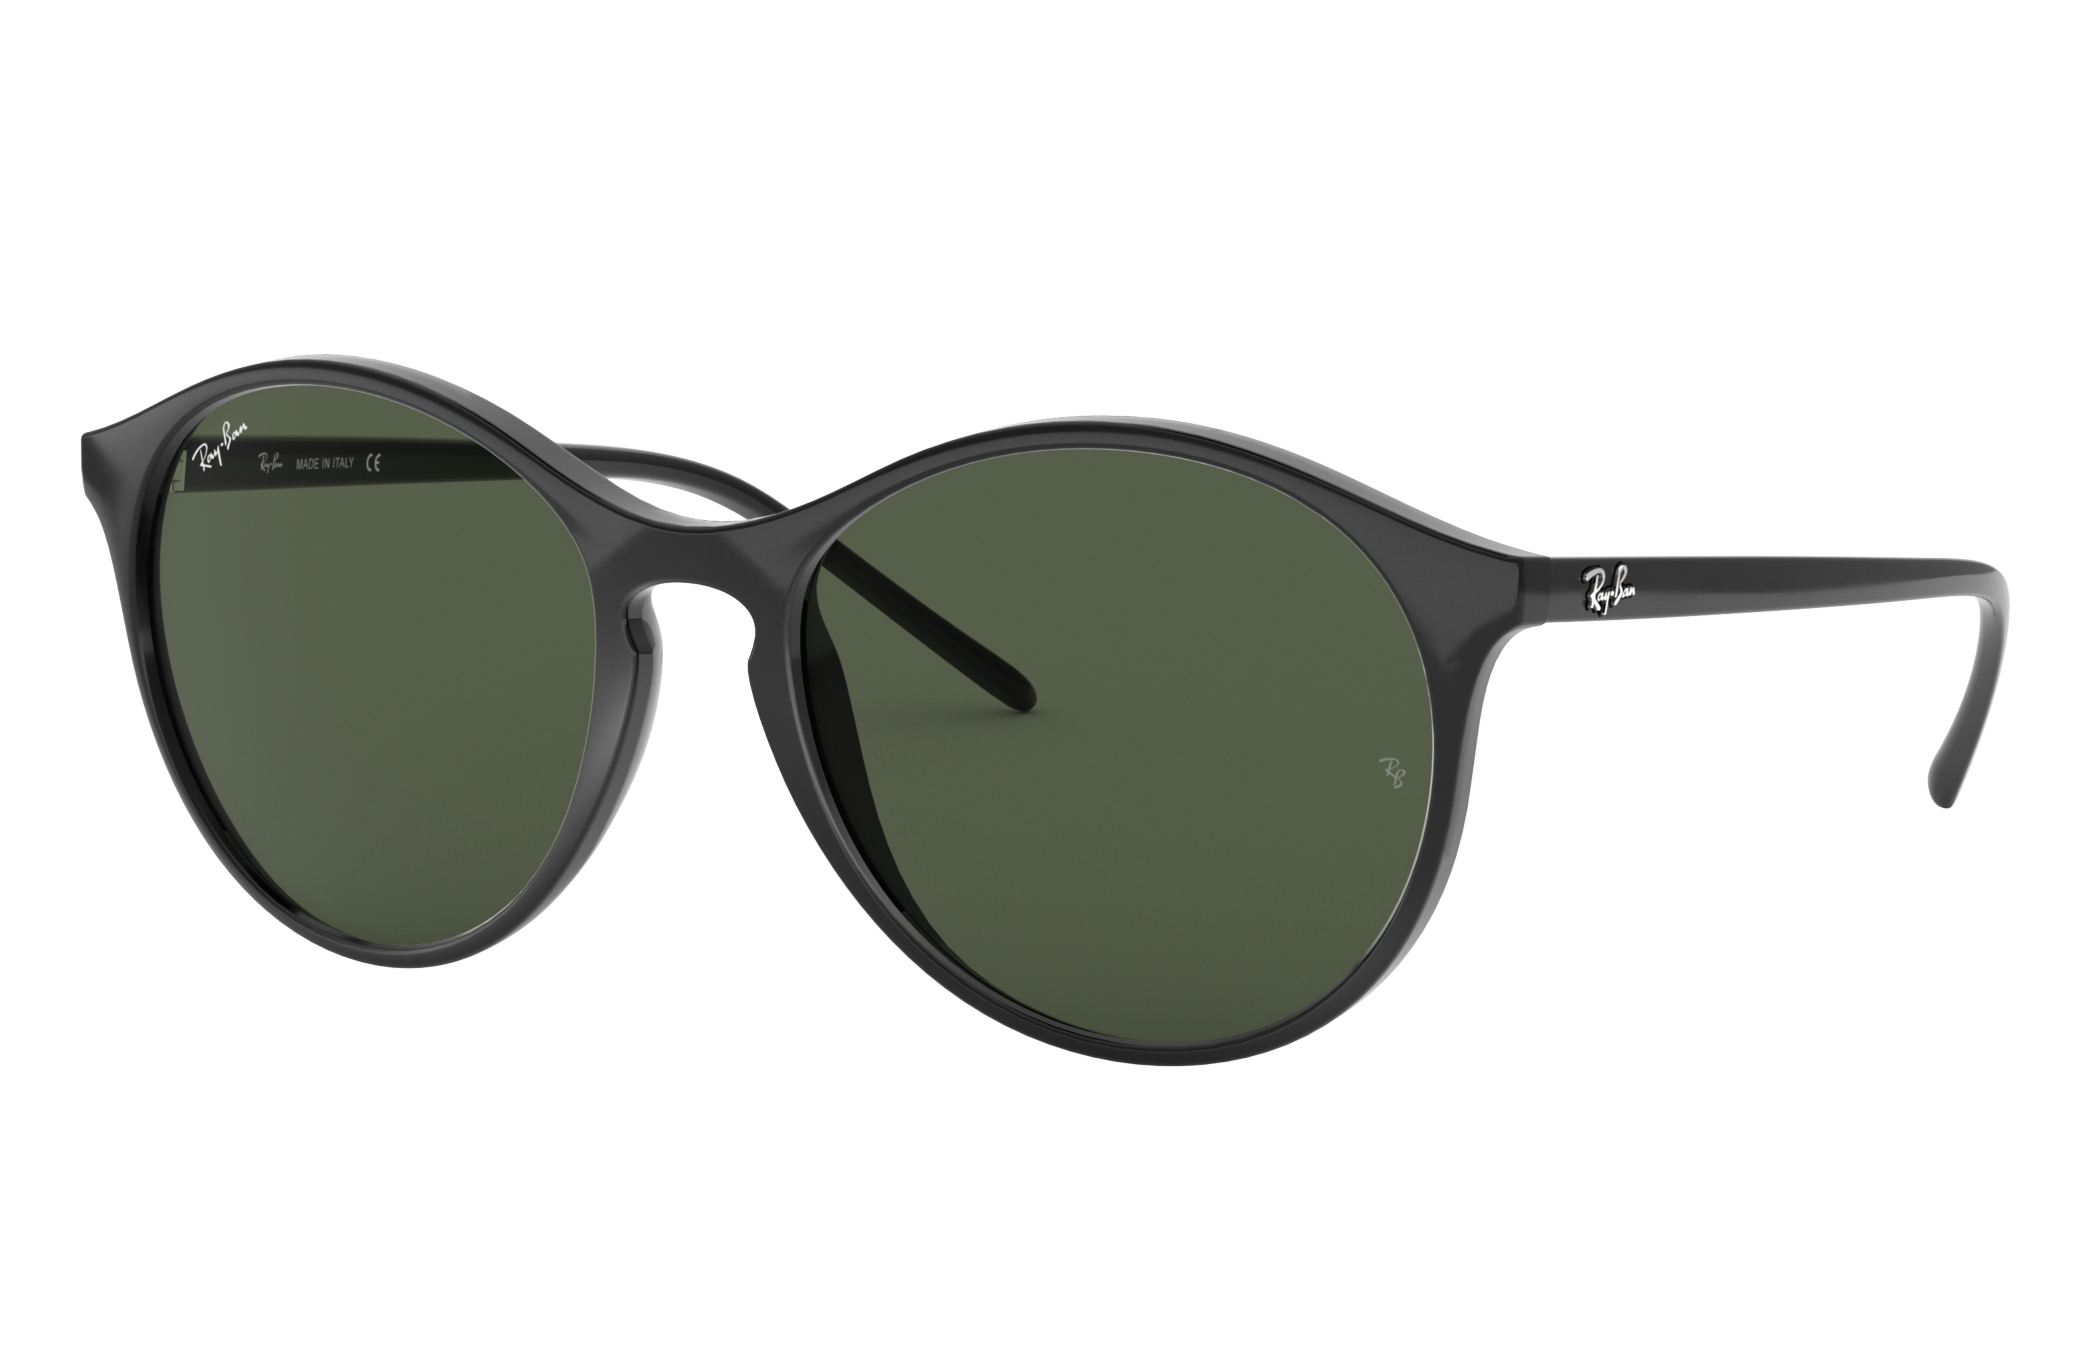 Ray-Ban Rb4371 Black, Green Lenses - RB4371